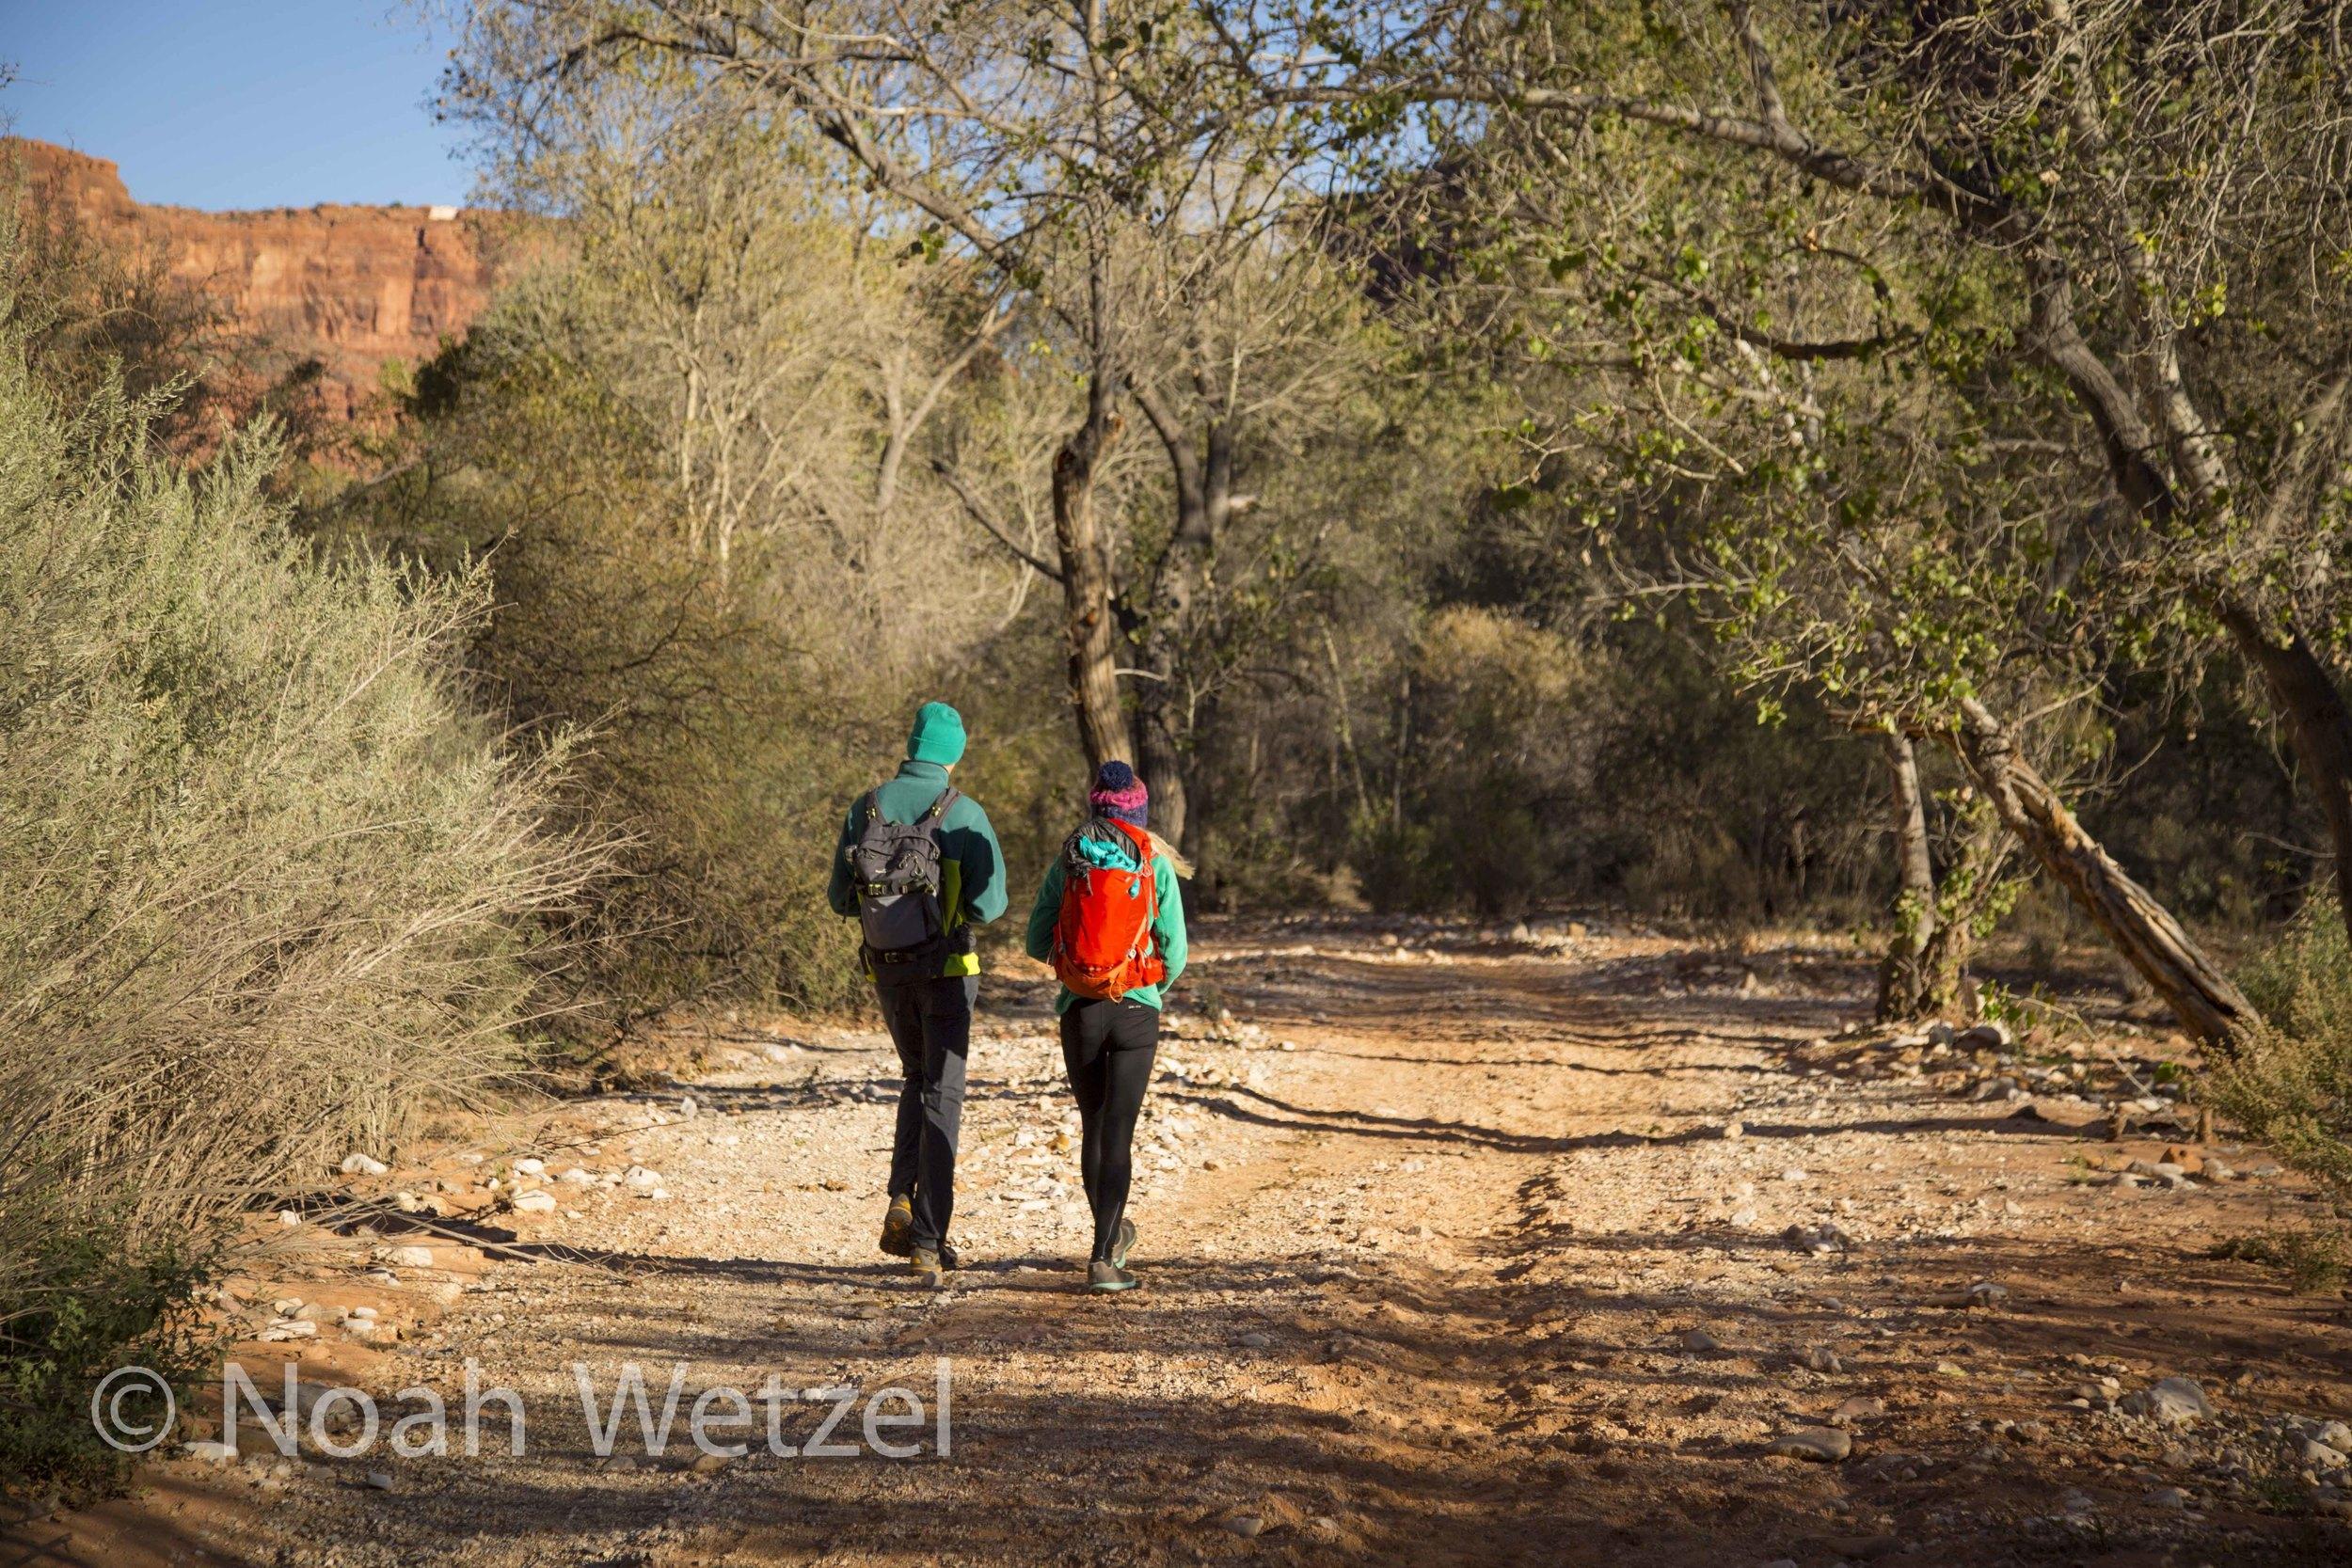 Jerome and Rachel approaching Supai, Arizona